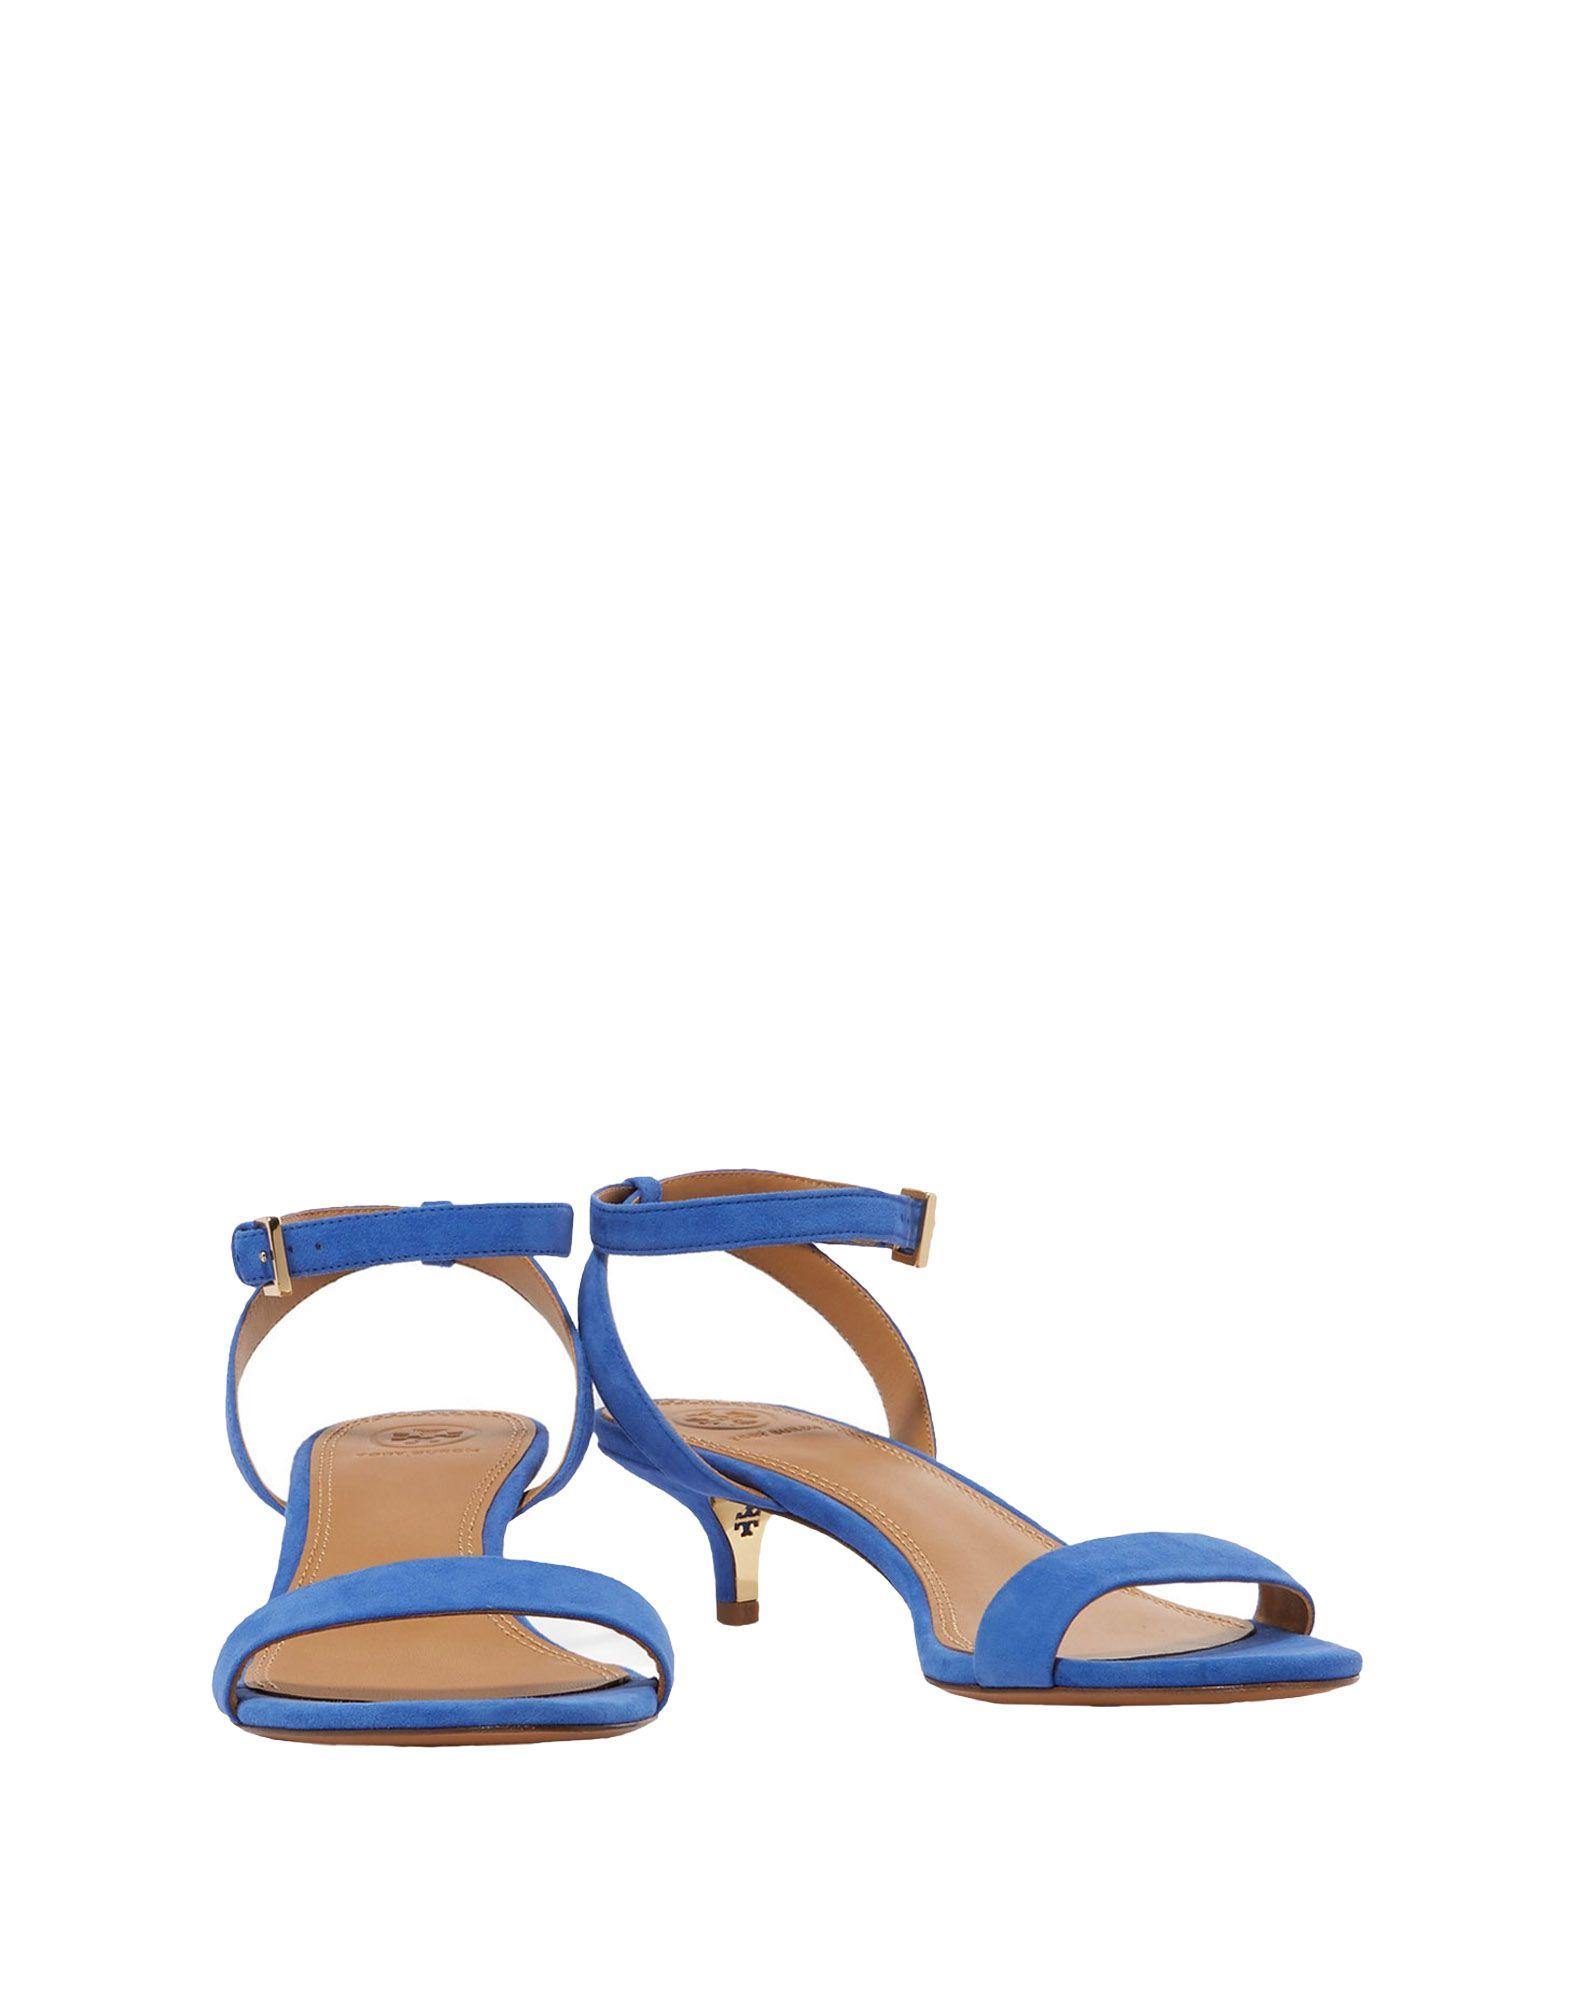 Tory Burch Sandalen Damen  11516511XWGut aussehende strapazierfähige Schuhe